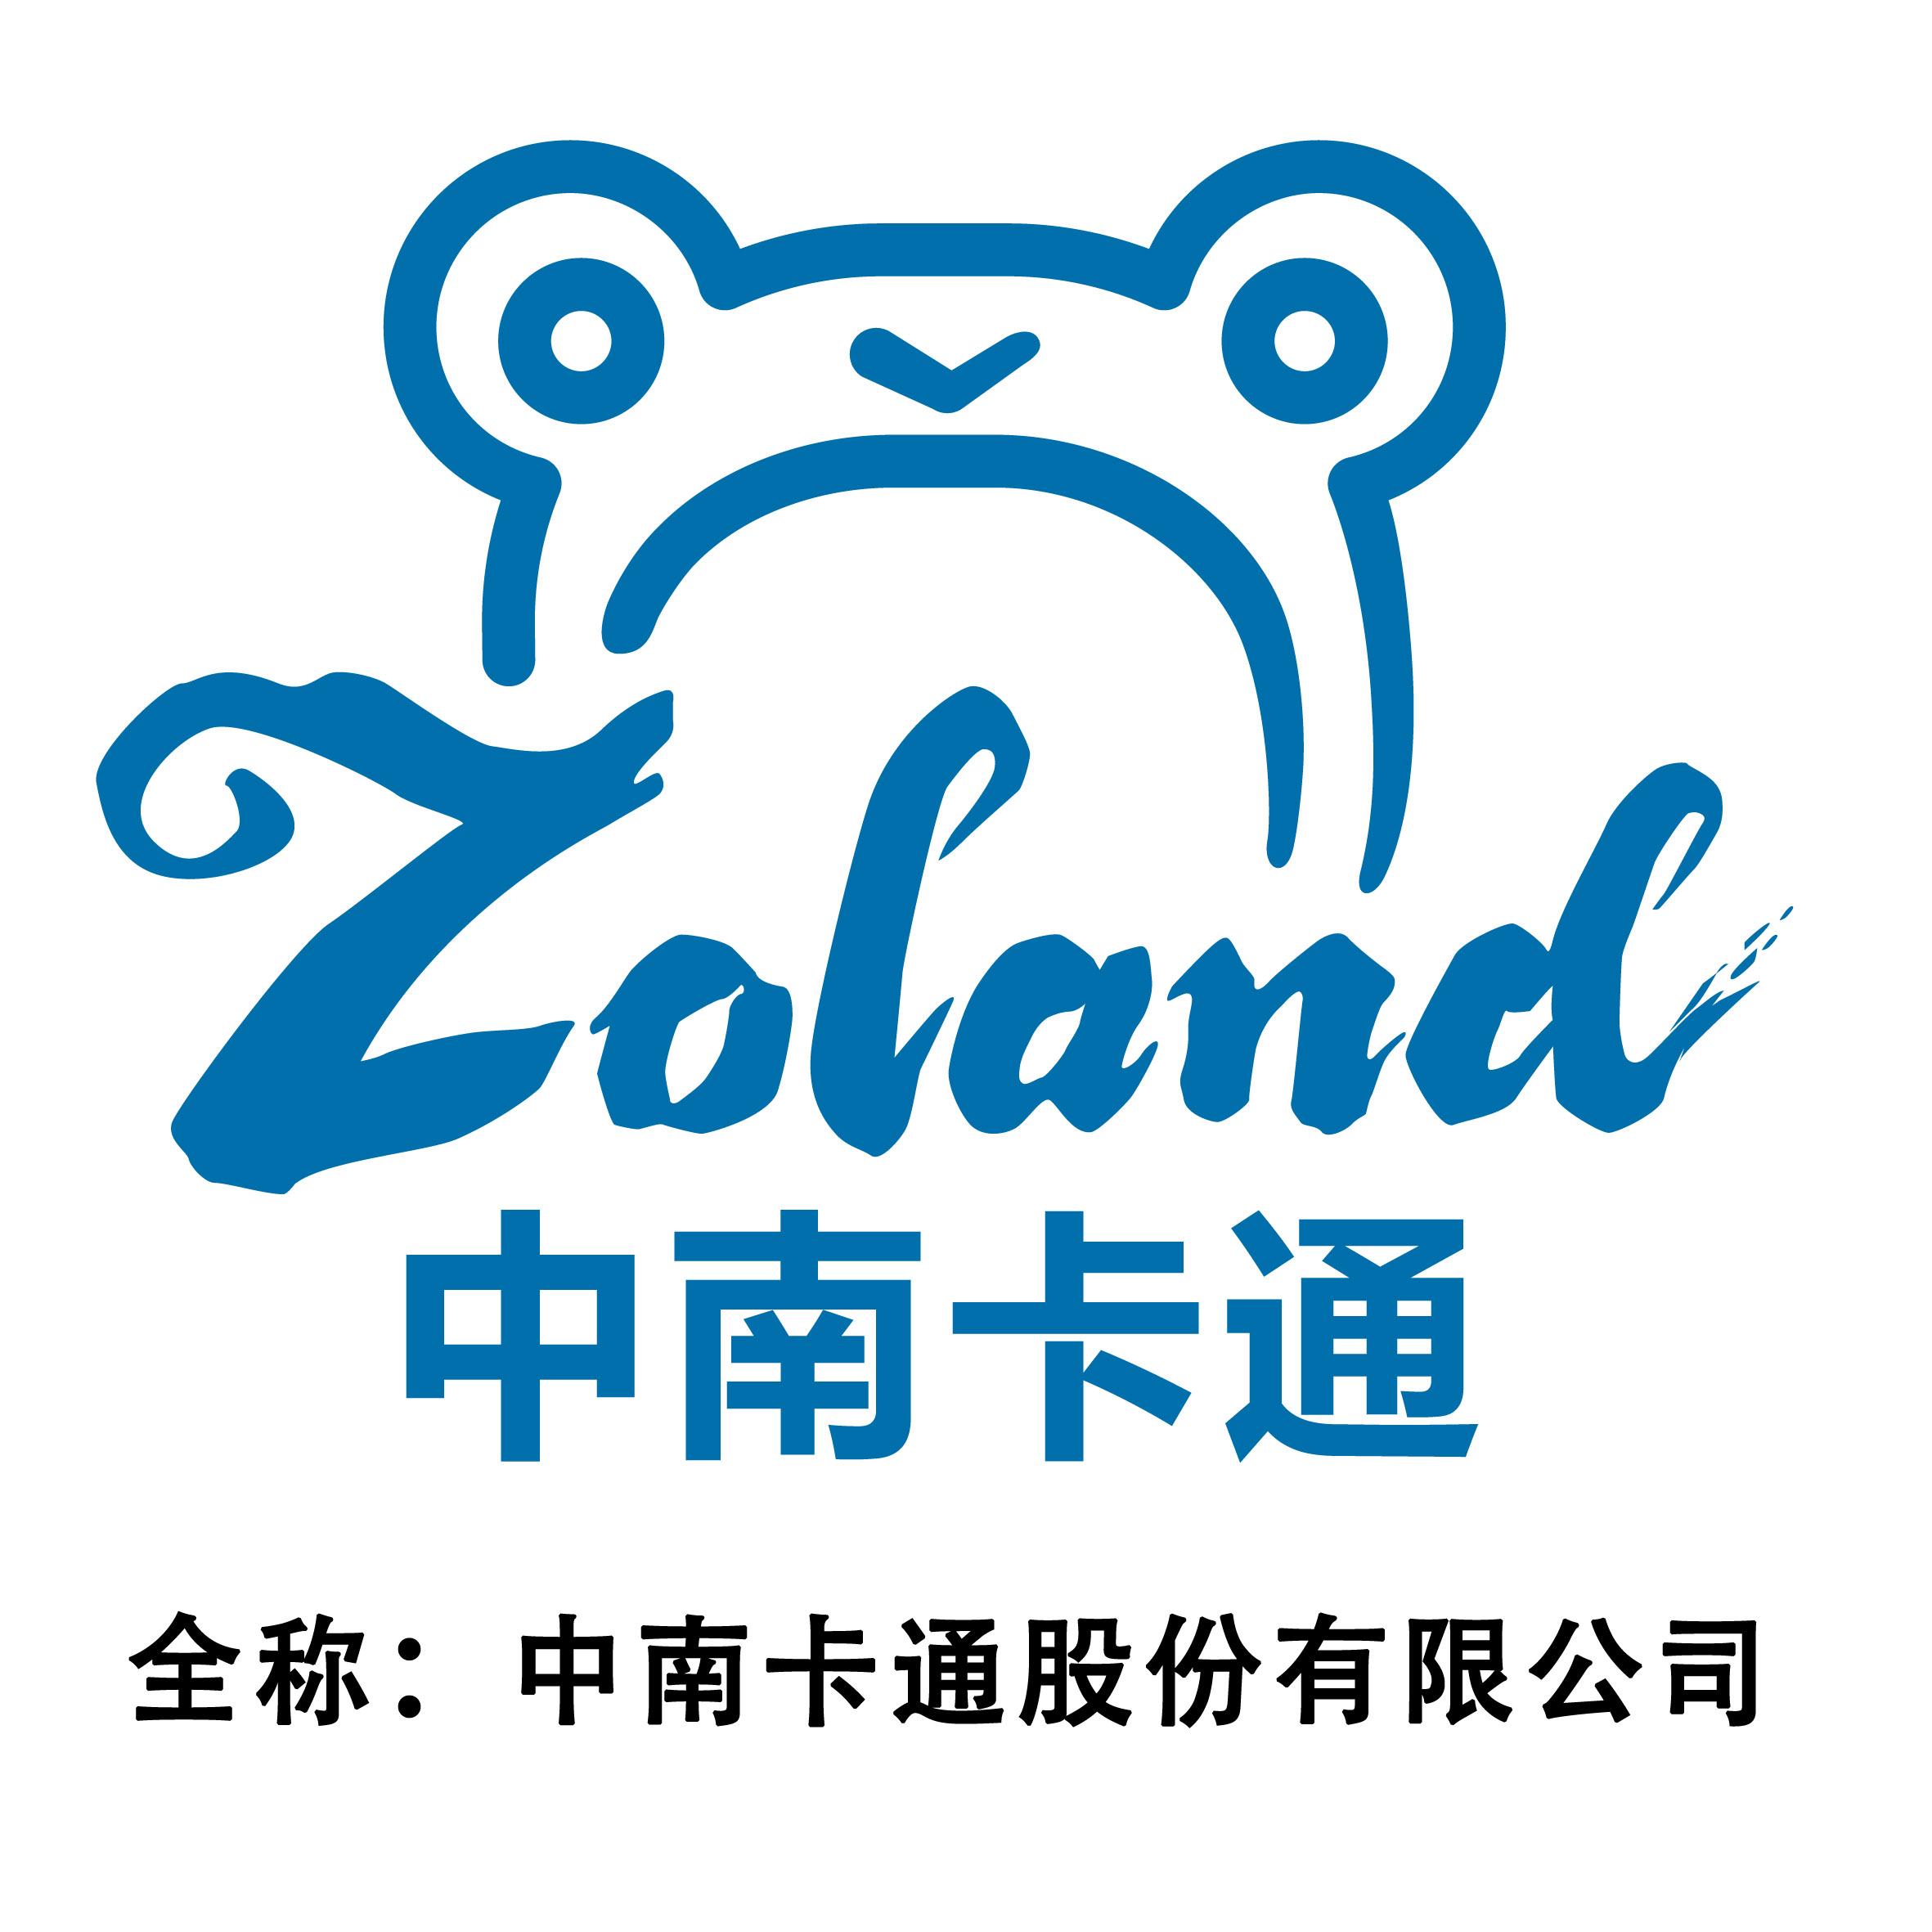 logo logo 标志 设计 图标 2362_2362